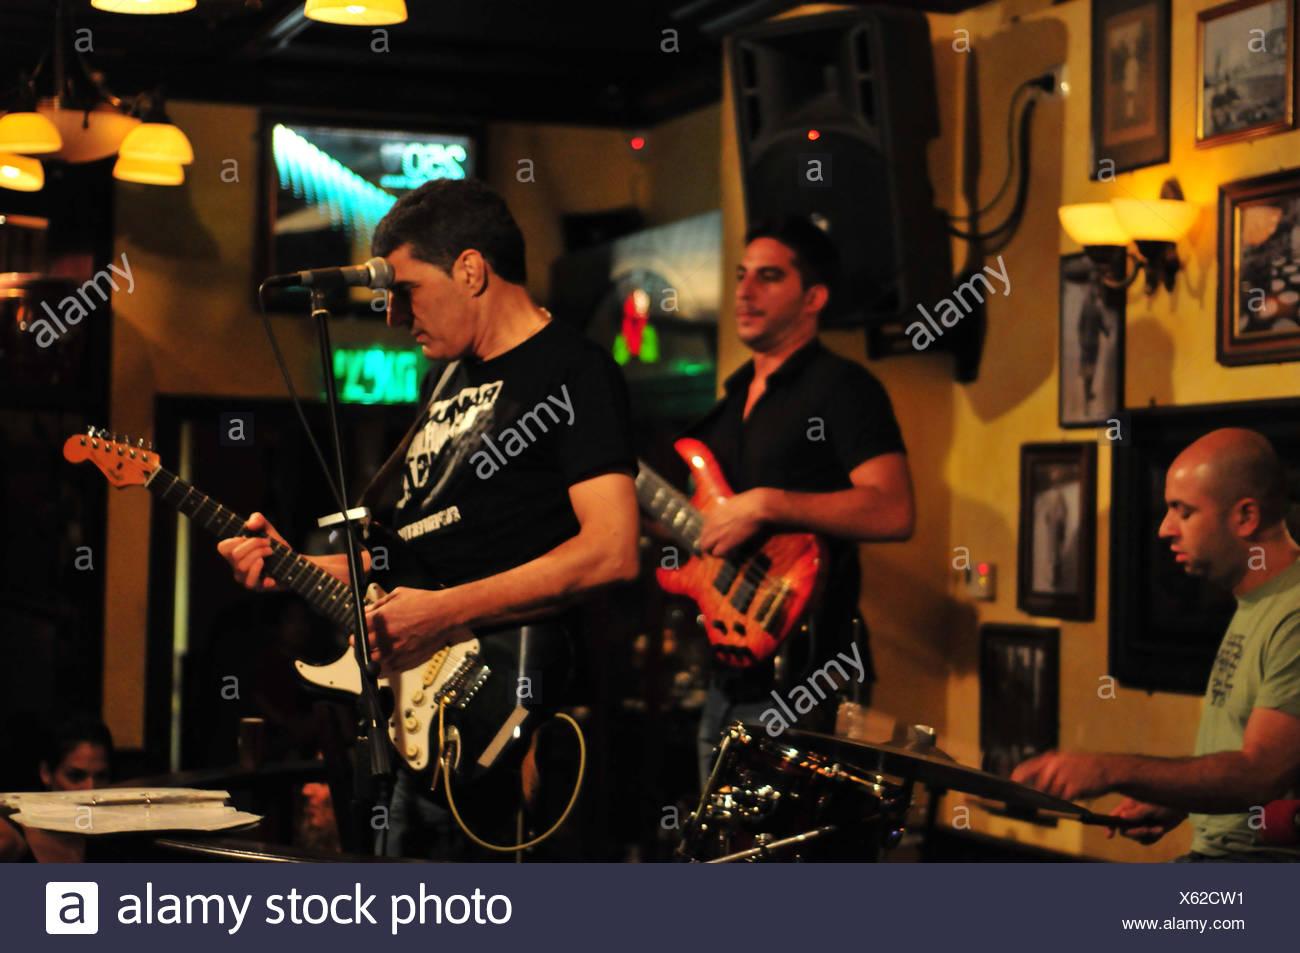 Israel, Haifa, Live show at a local pub - Stock Image